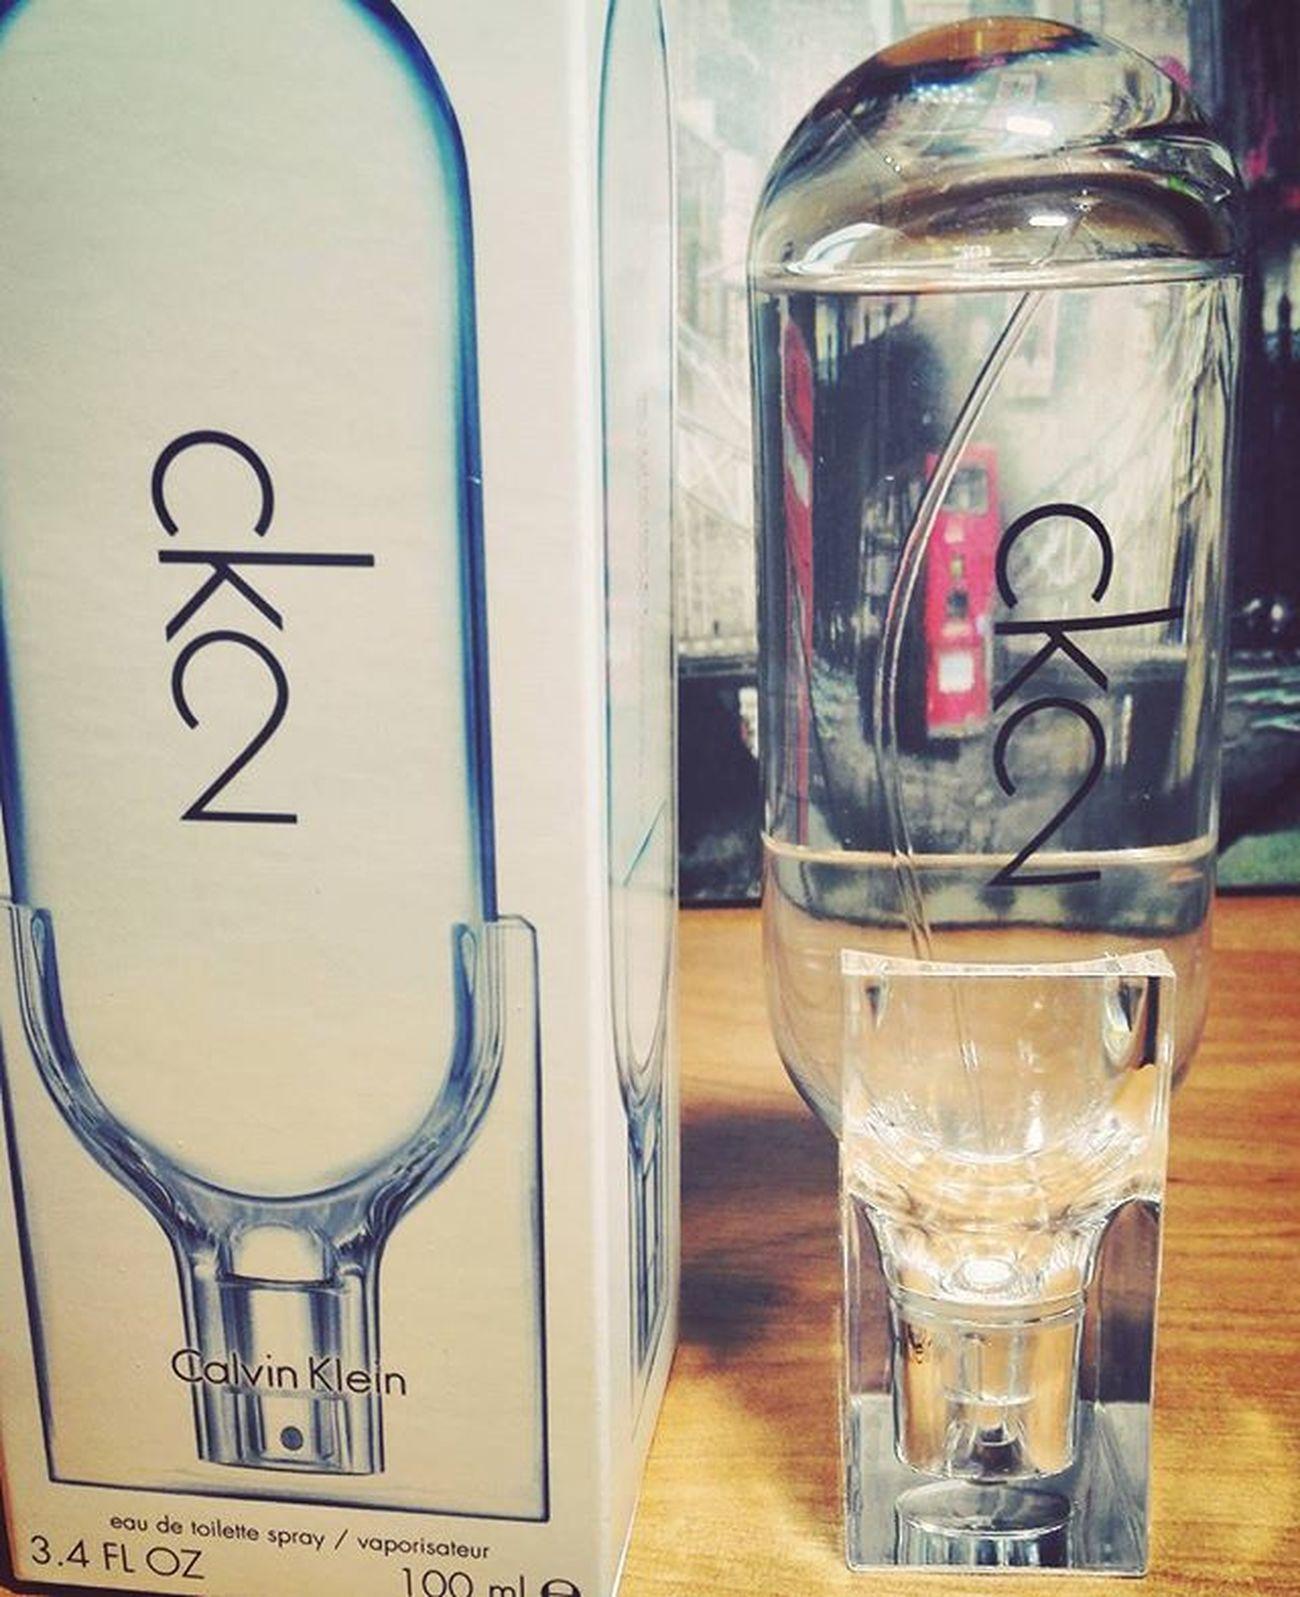 The2ofus Nowy Zakup Calvin Klein Ck2 New Fragrance 2016 Unisex So Swag Polishboy  Instaboy Insta